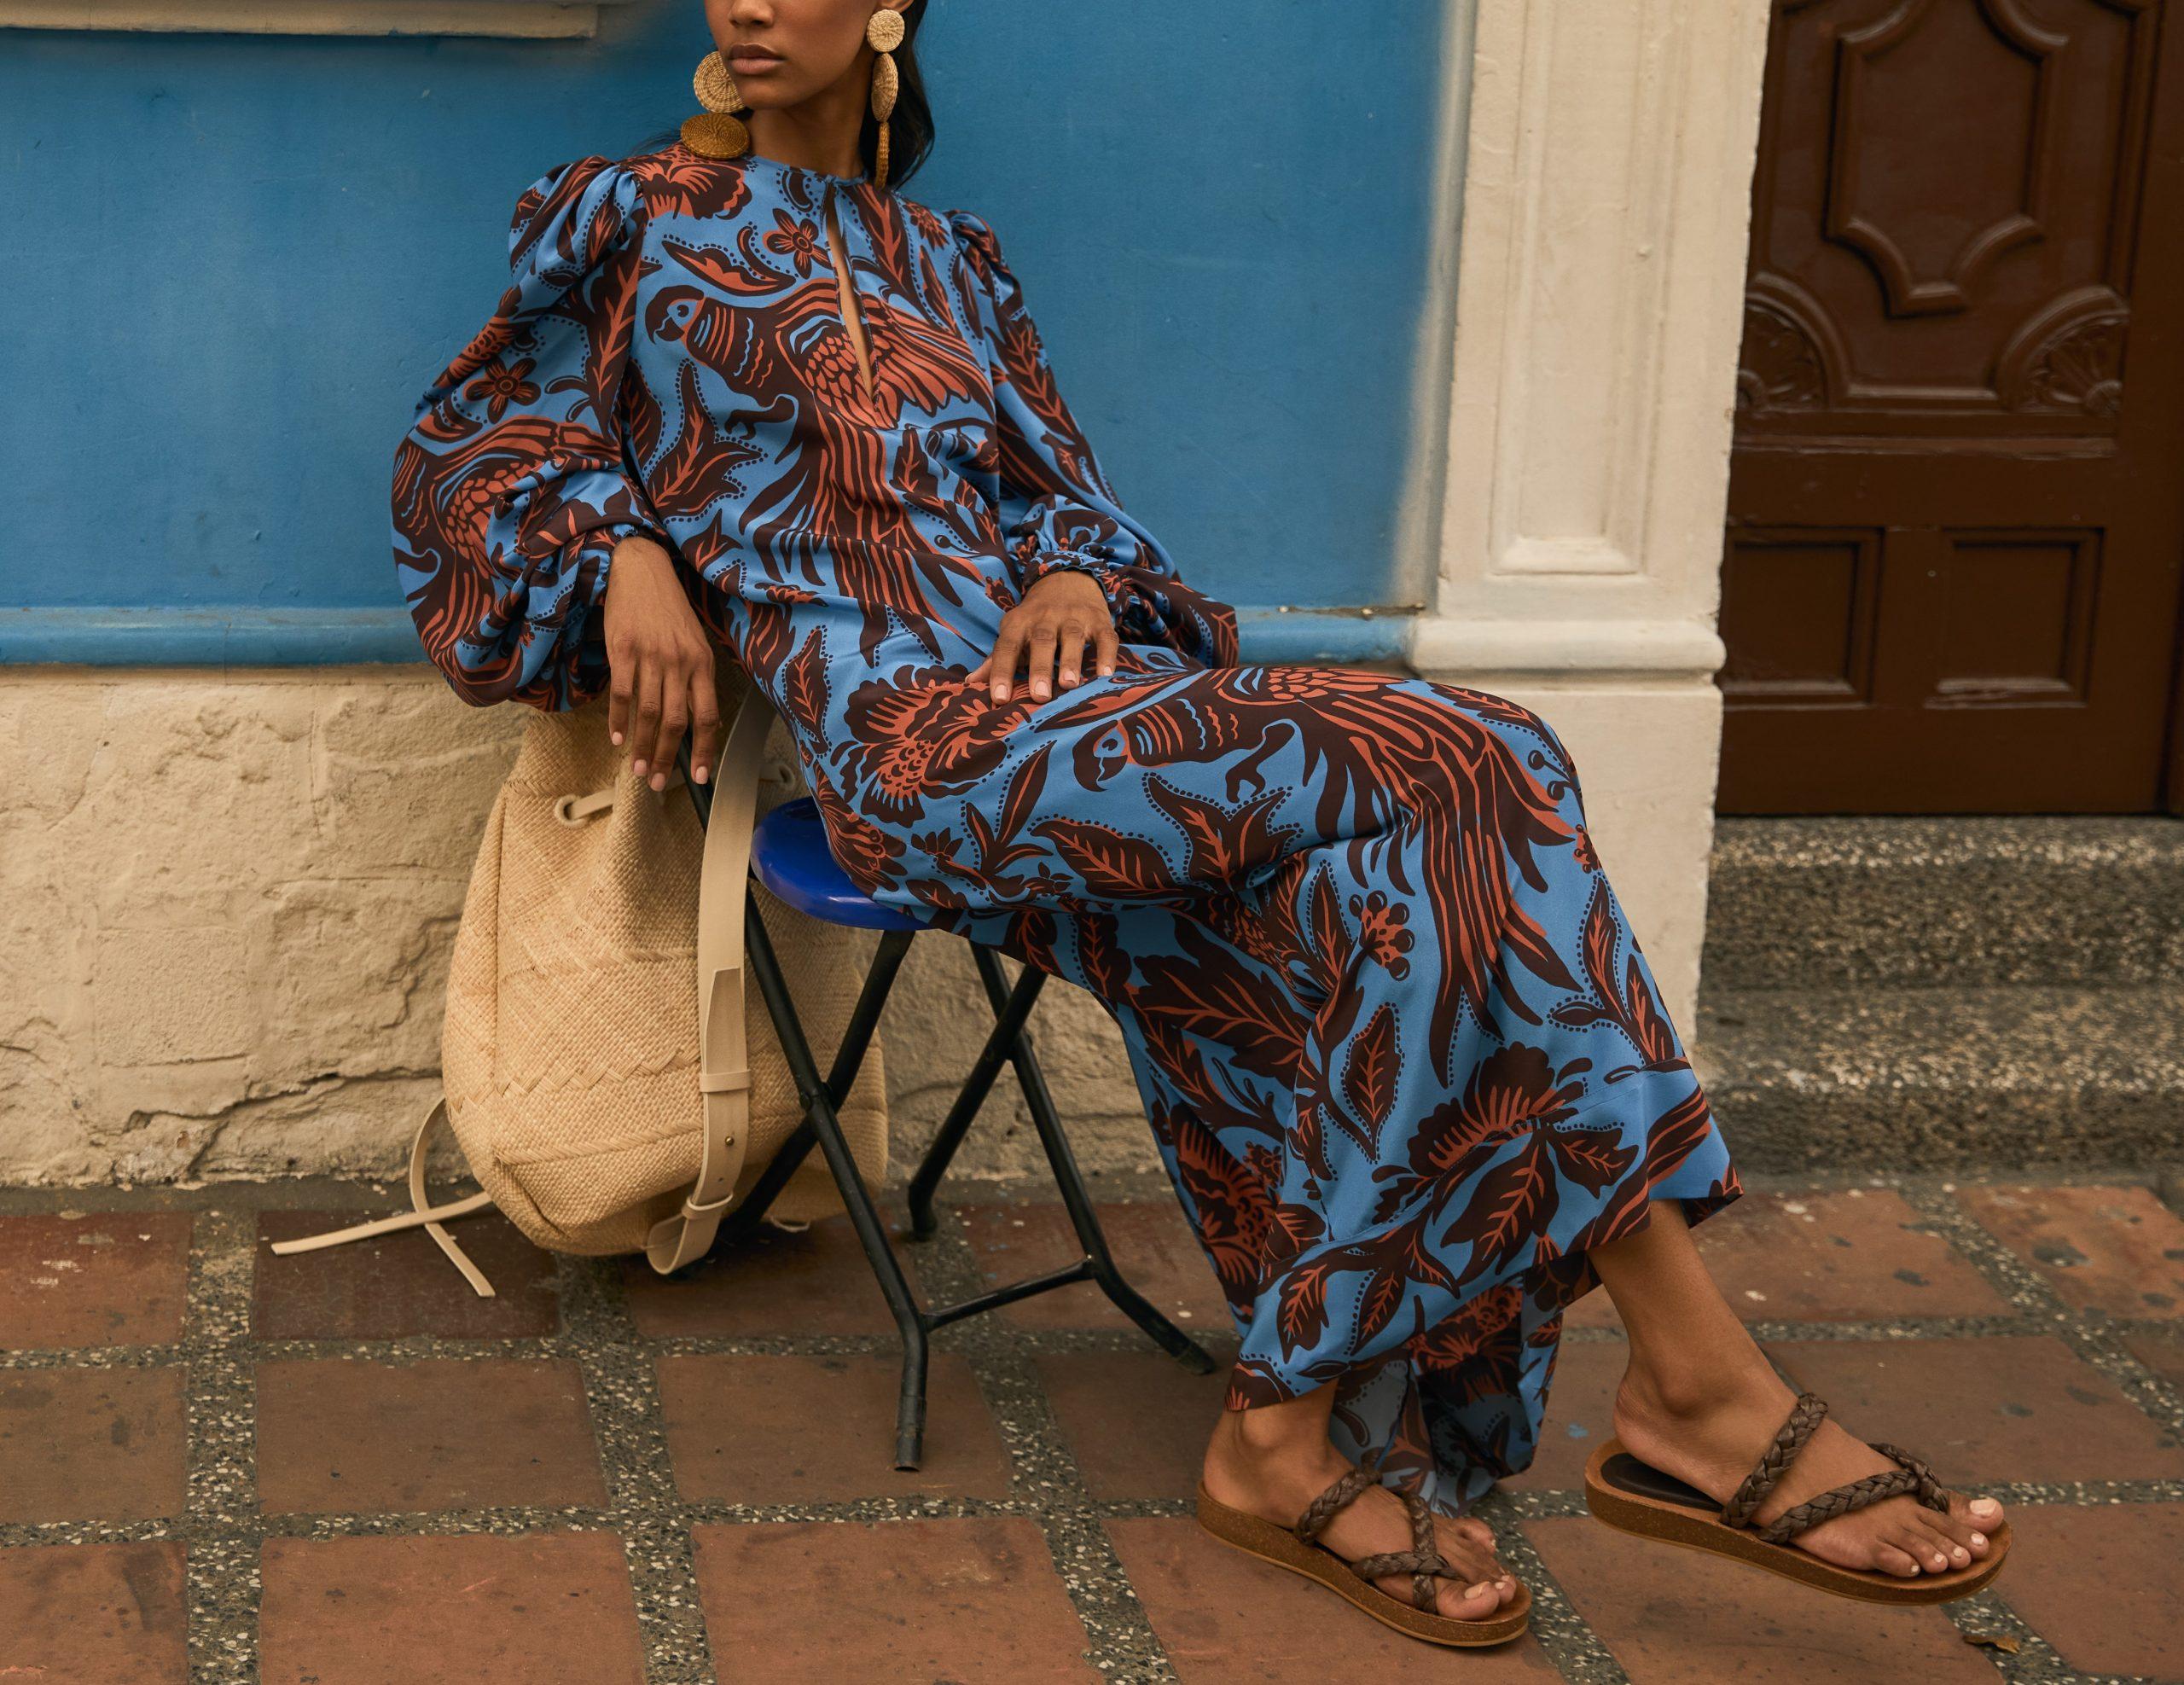 Peças de Johanna Ortiz chega ao e-commerce Iguatemi 365. Confira!